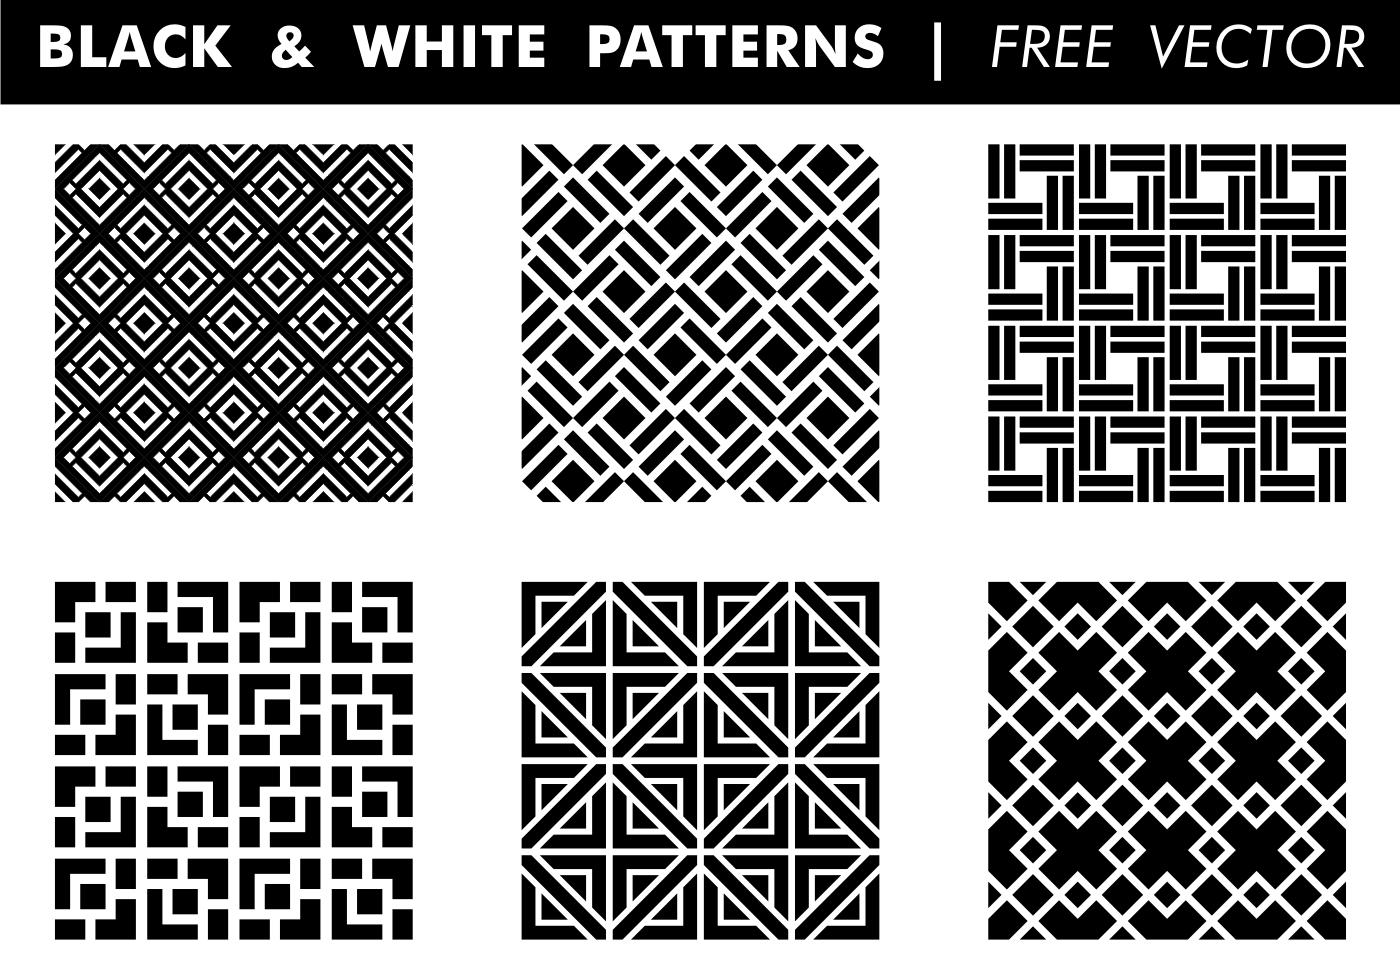 Black & White Patterns Free Vector